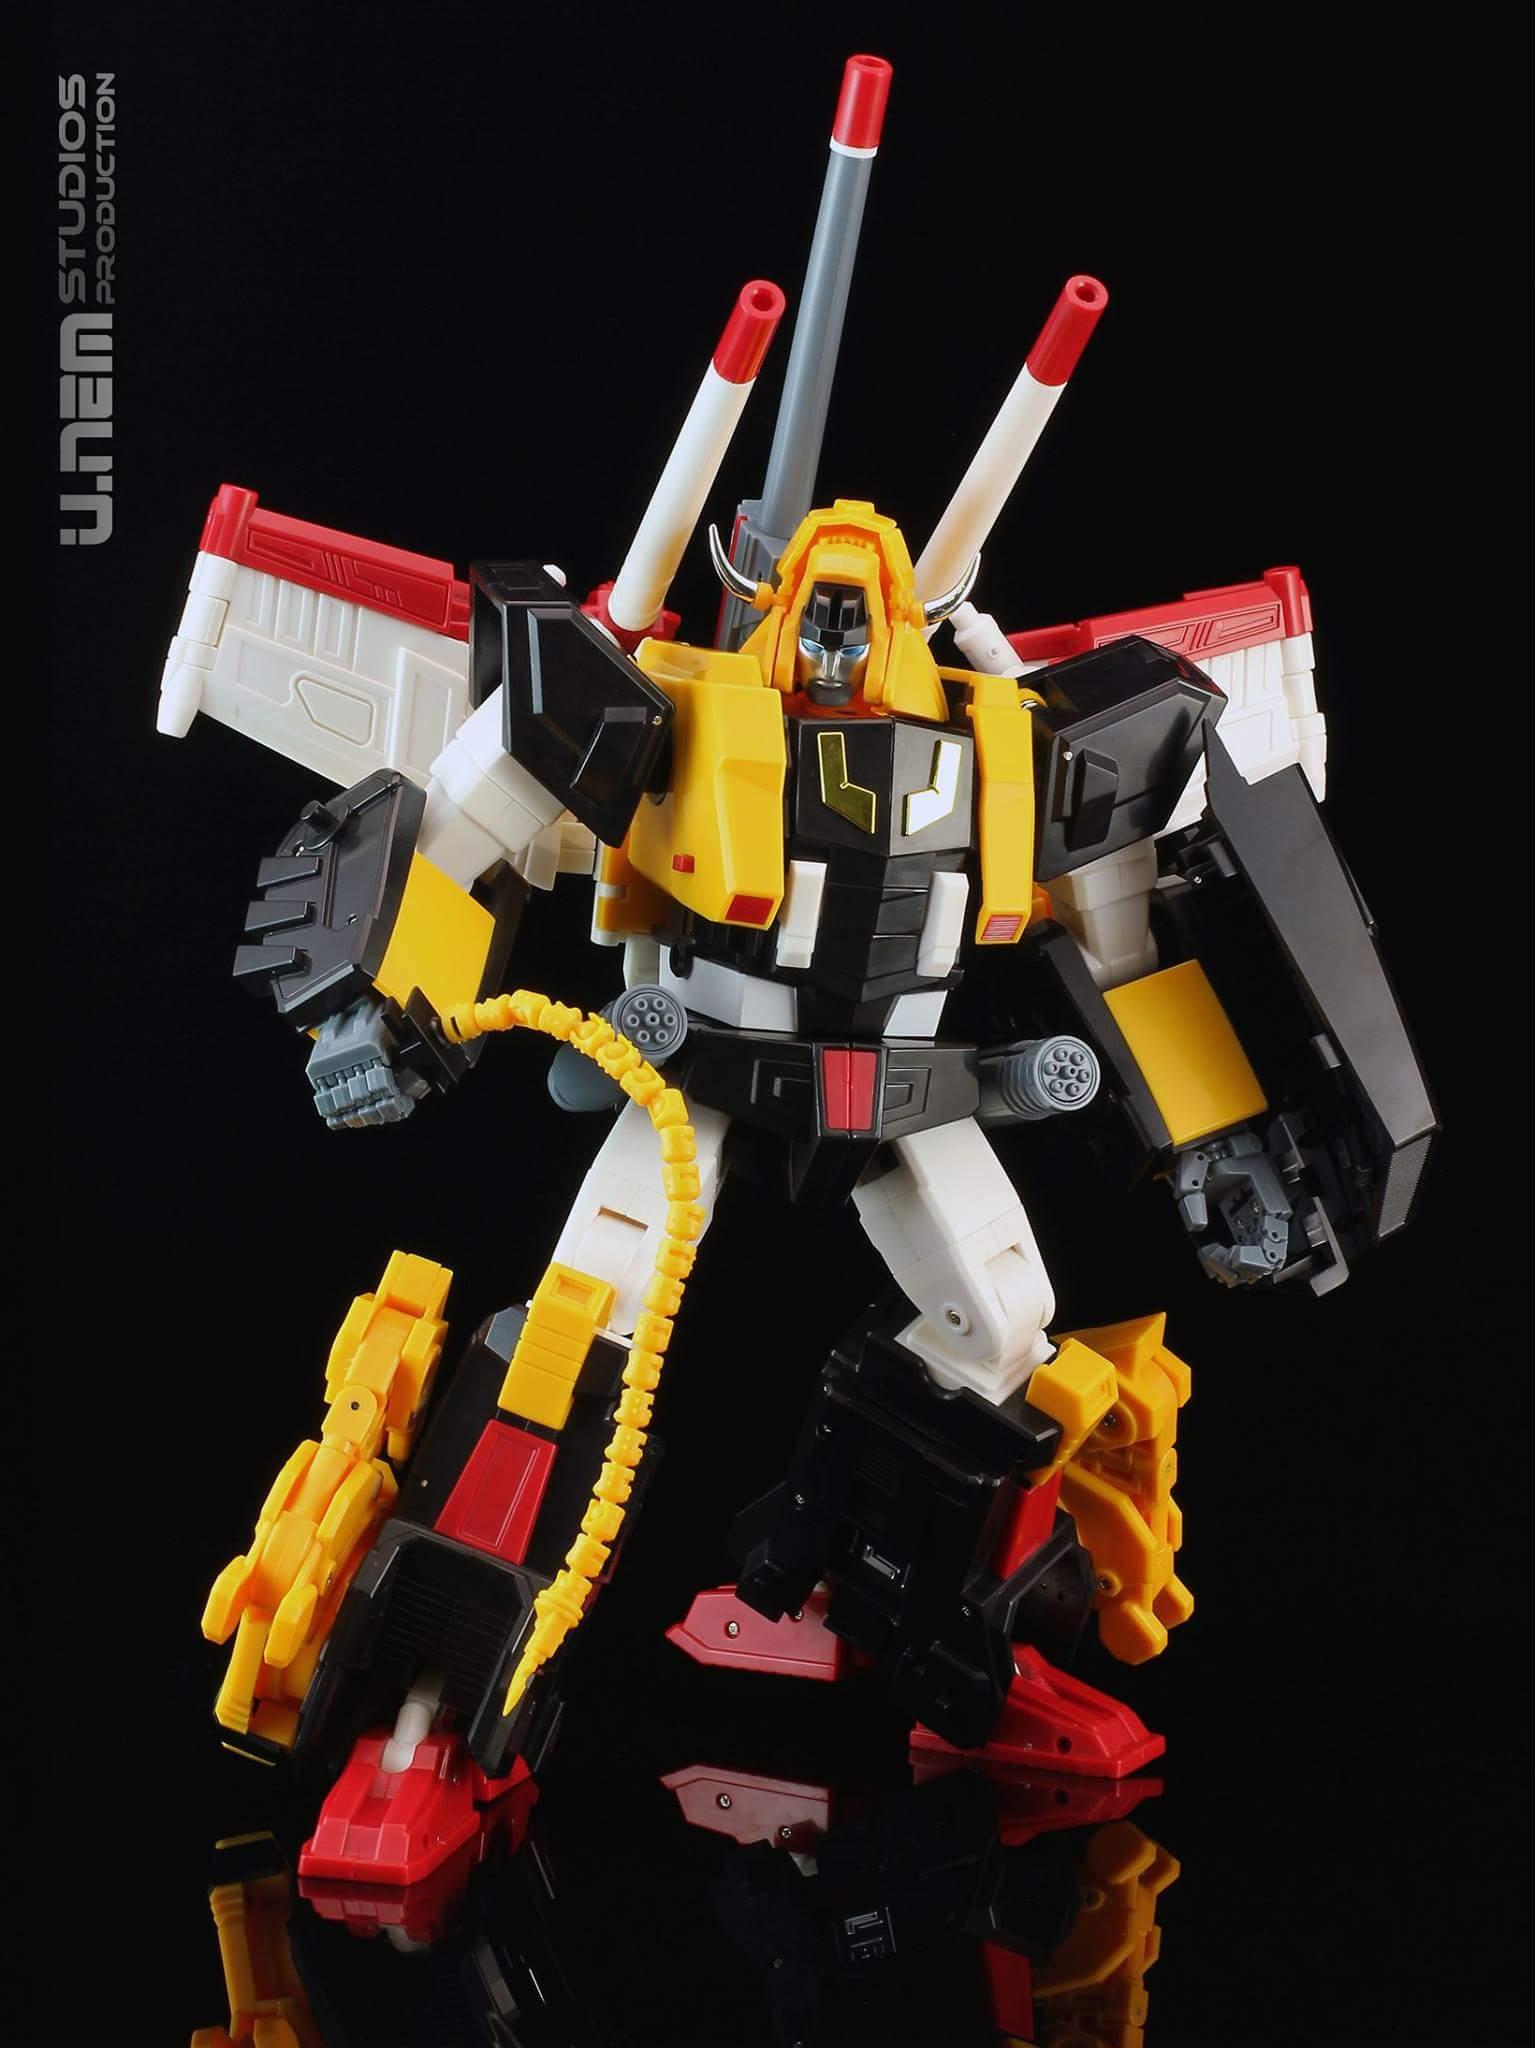 [KFC Toys] Produit Tiers - Jouet Phase 8-A Simba - aka Victory Leo (Transformers Victory) - Page 2 NH8DwI2z